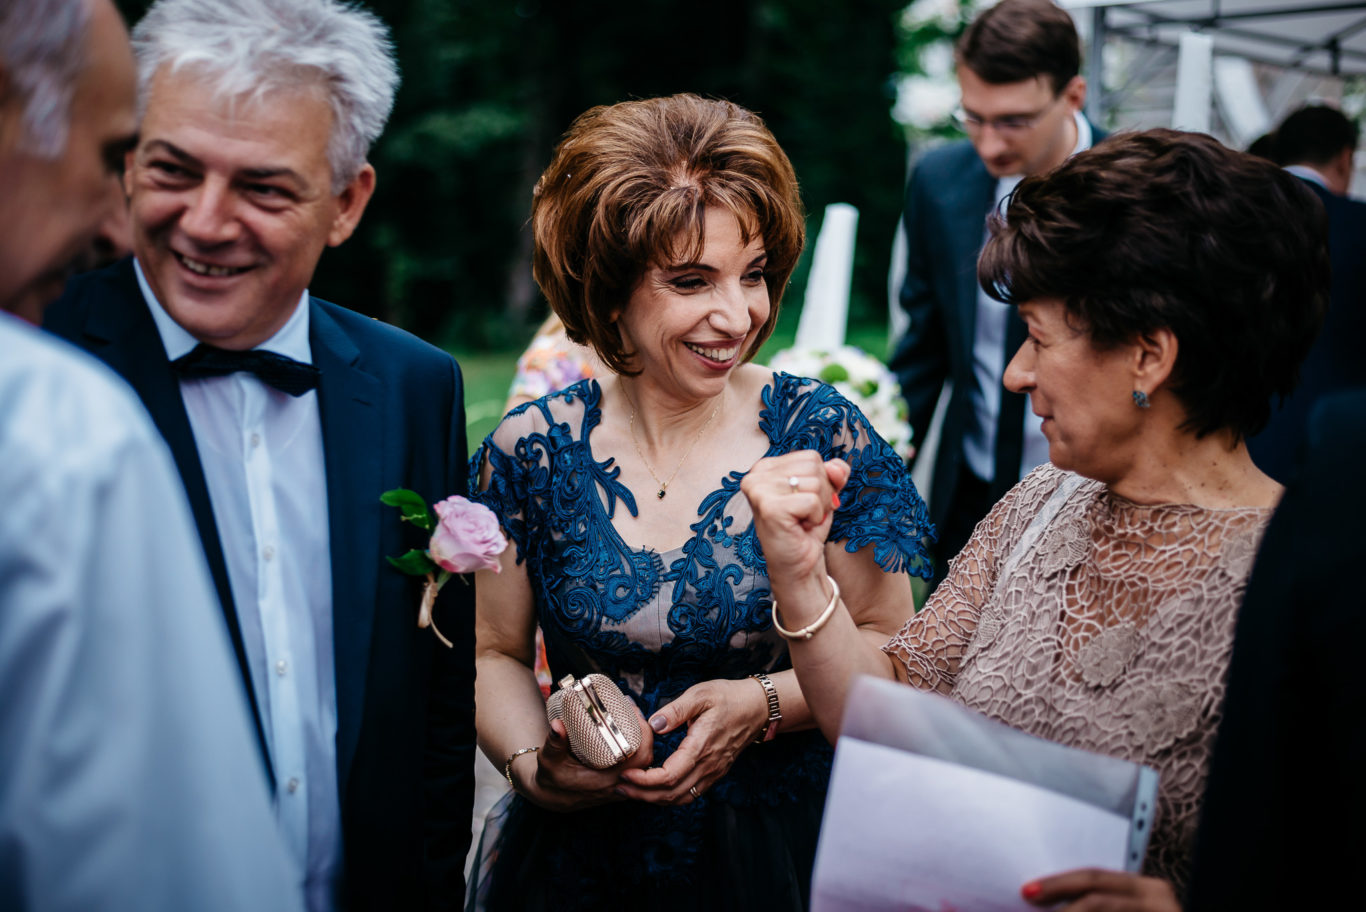 0440-Fotografie-nunta-Stirbey-Laura-Rares-fotograf-Ciprian-Dumitrescu-DSC_7137